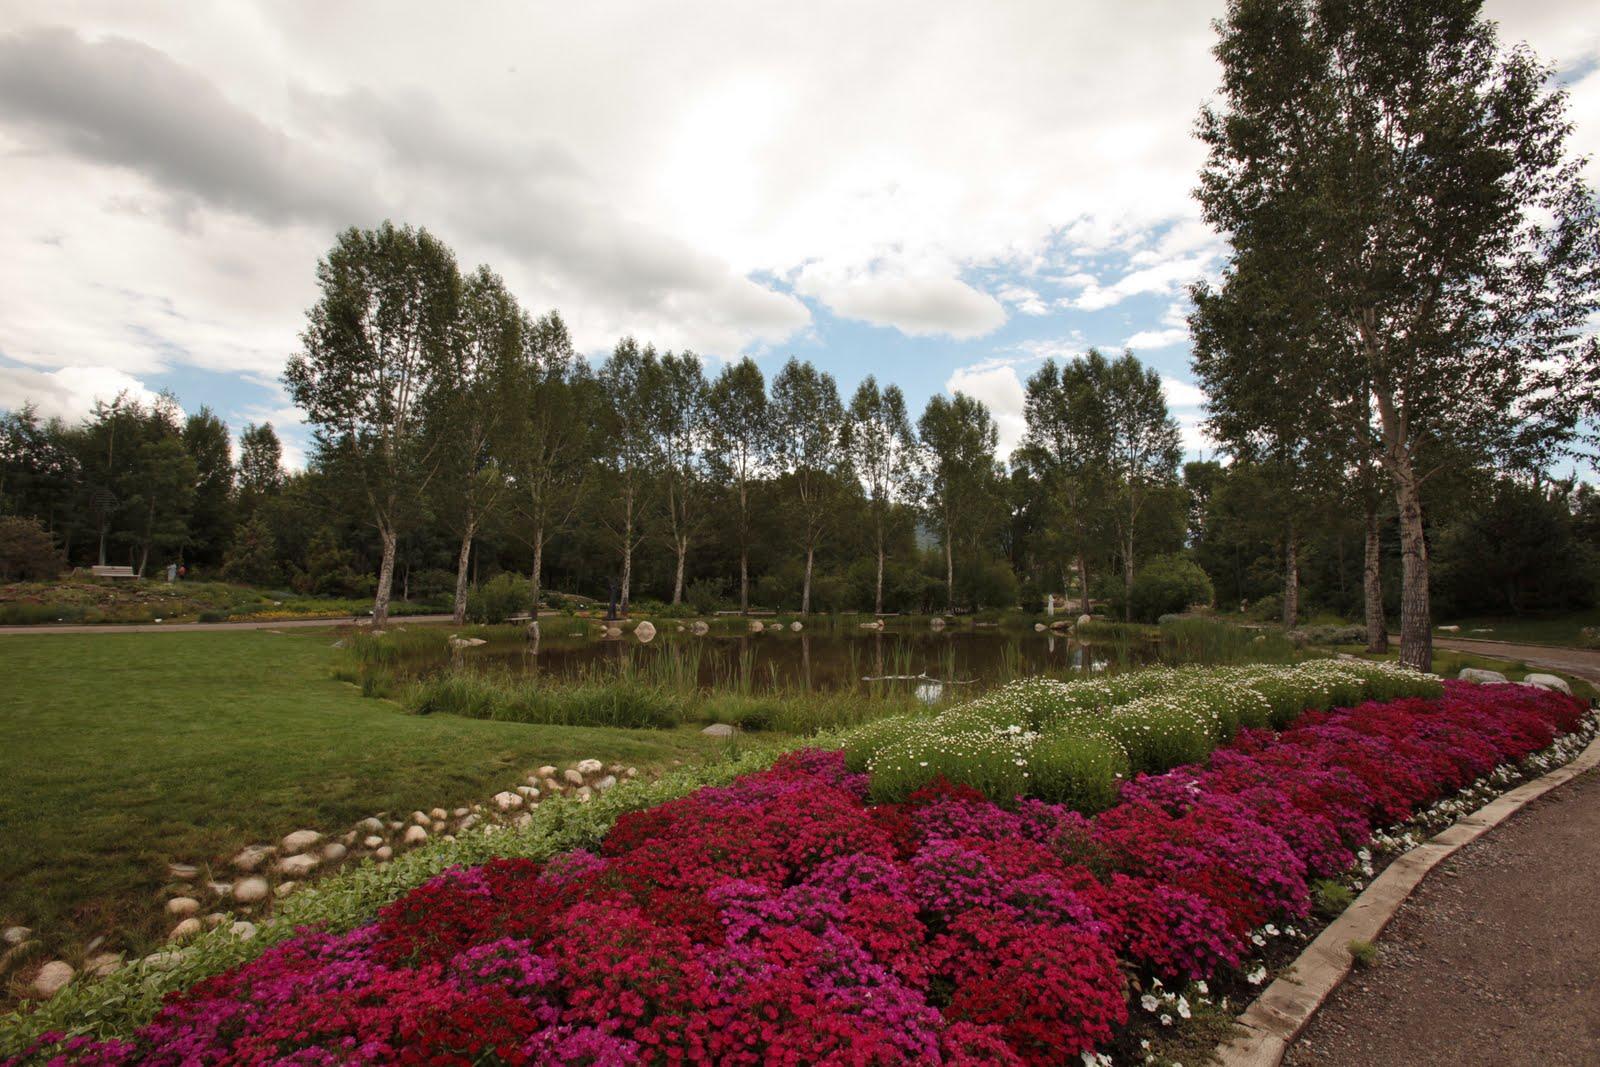 Colorado Day 7 - Yampa River Botanic Park